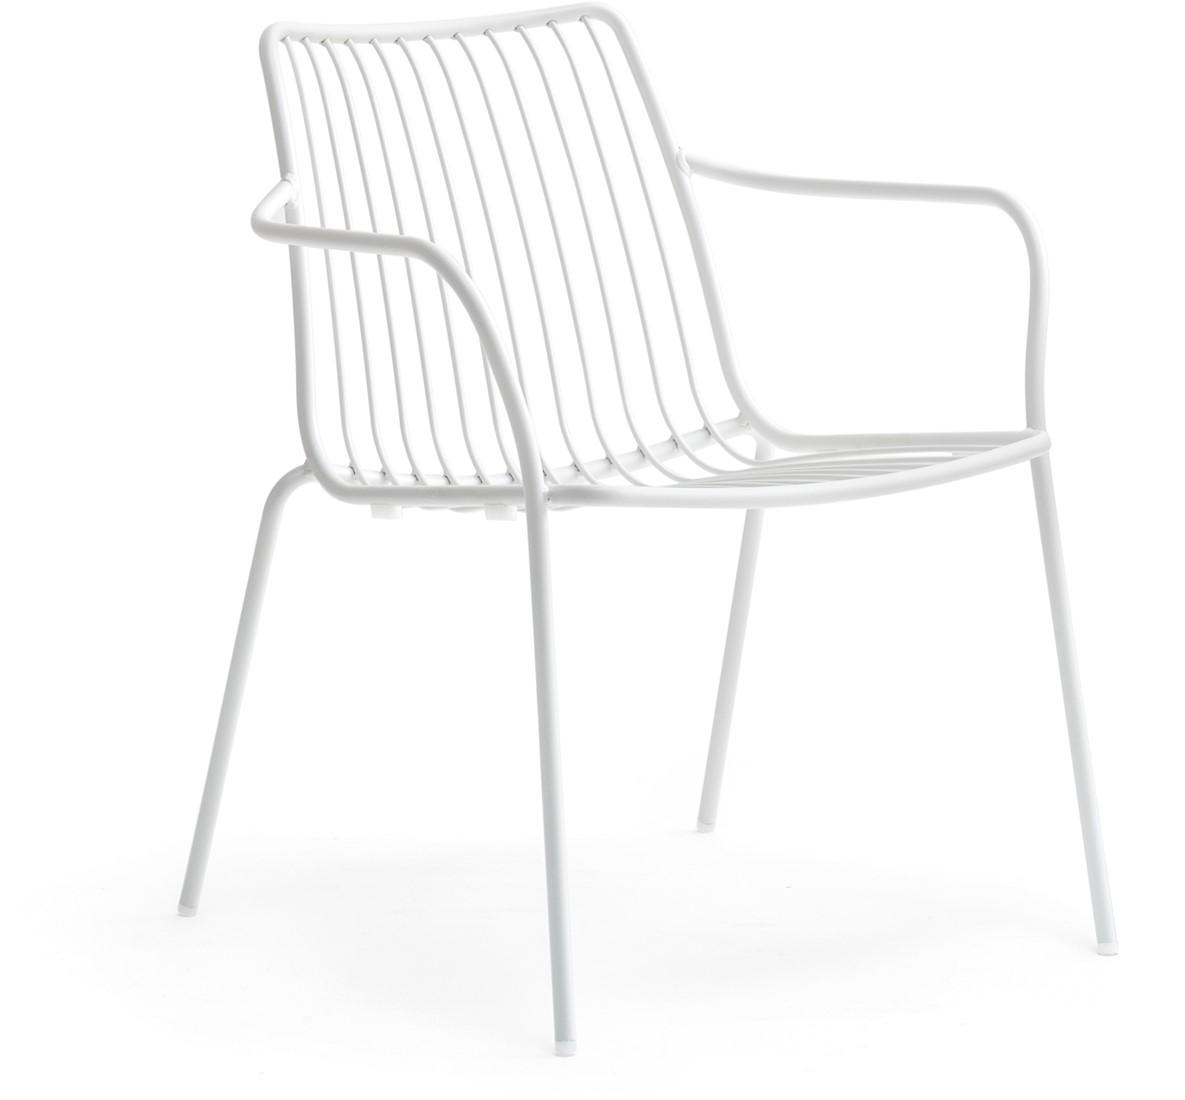 Lounge Stoel Wit.Nolita 3659 Stalen Loungestoel Outdoor Terrasstoel Lounge Stoel